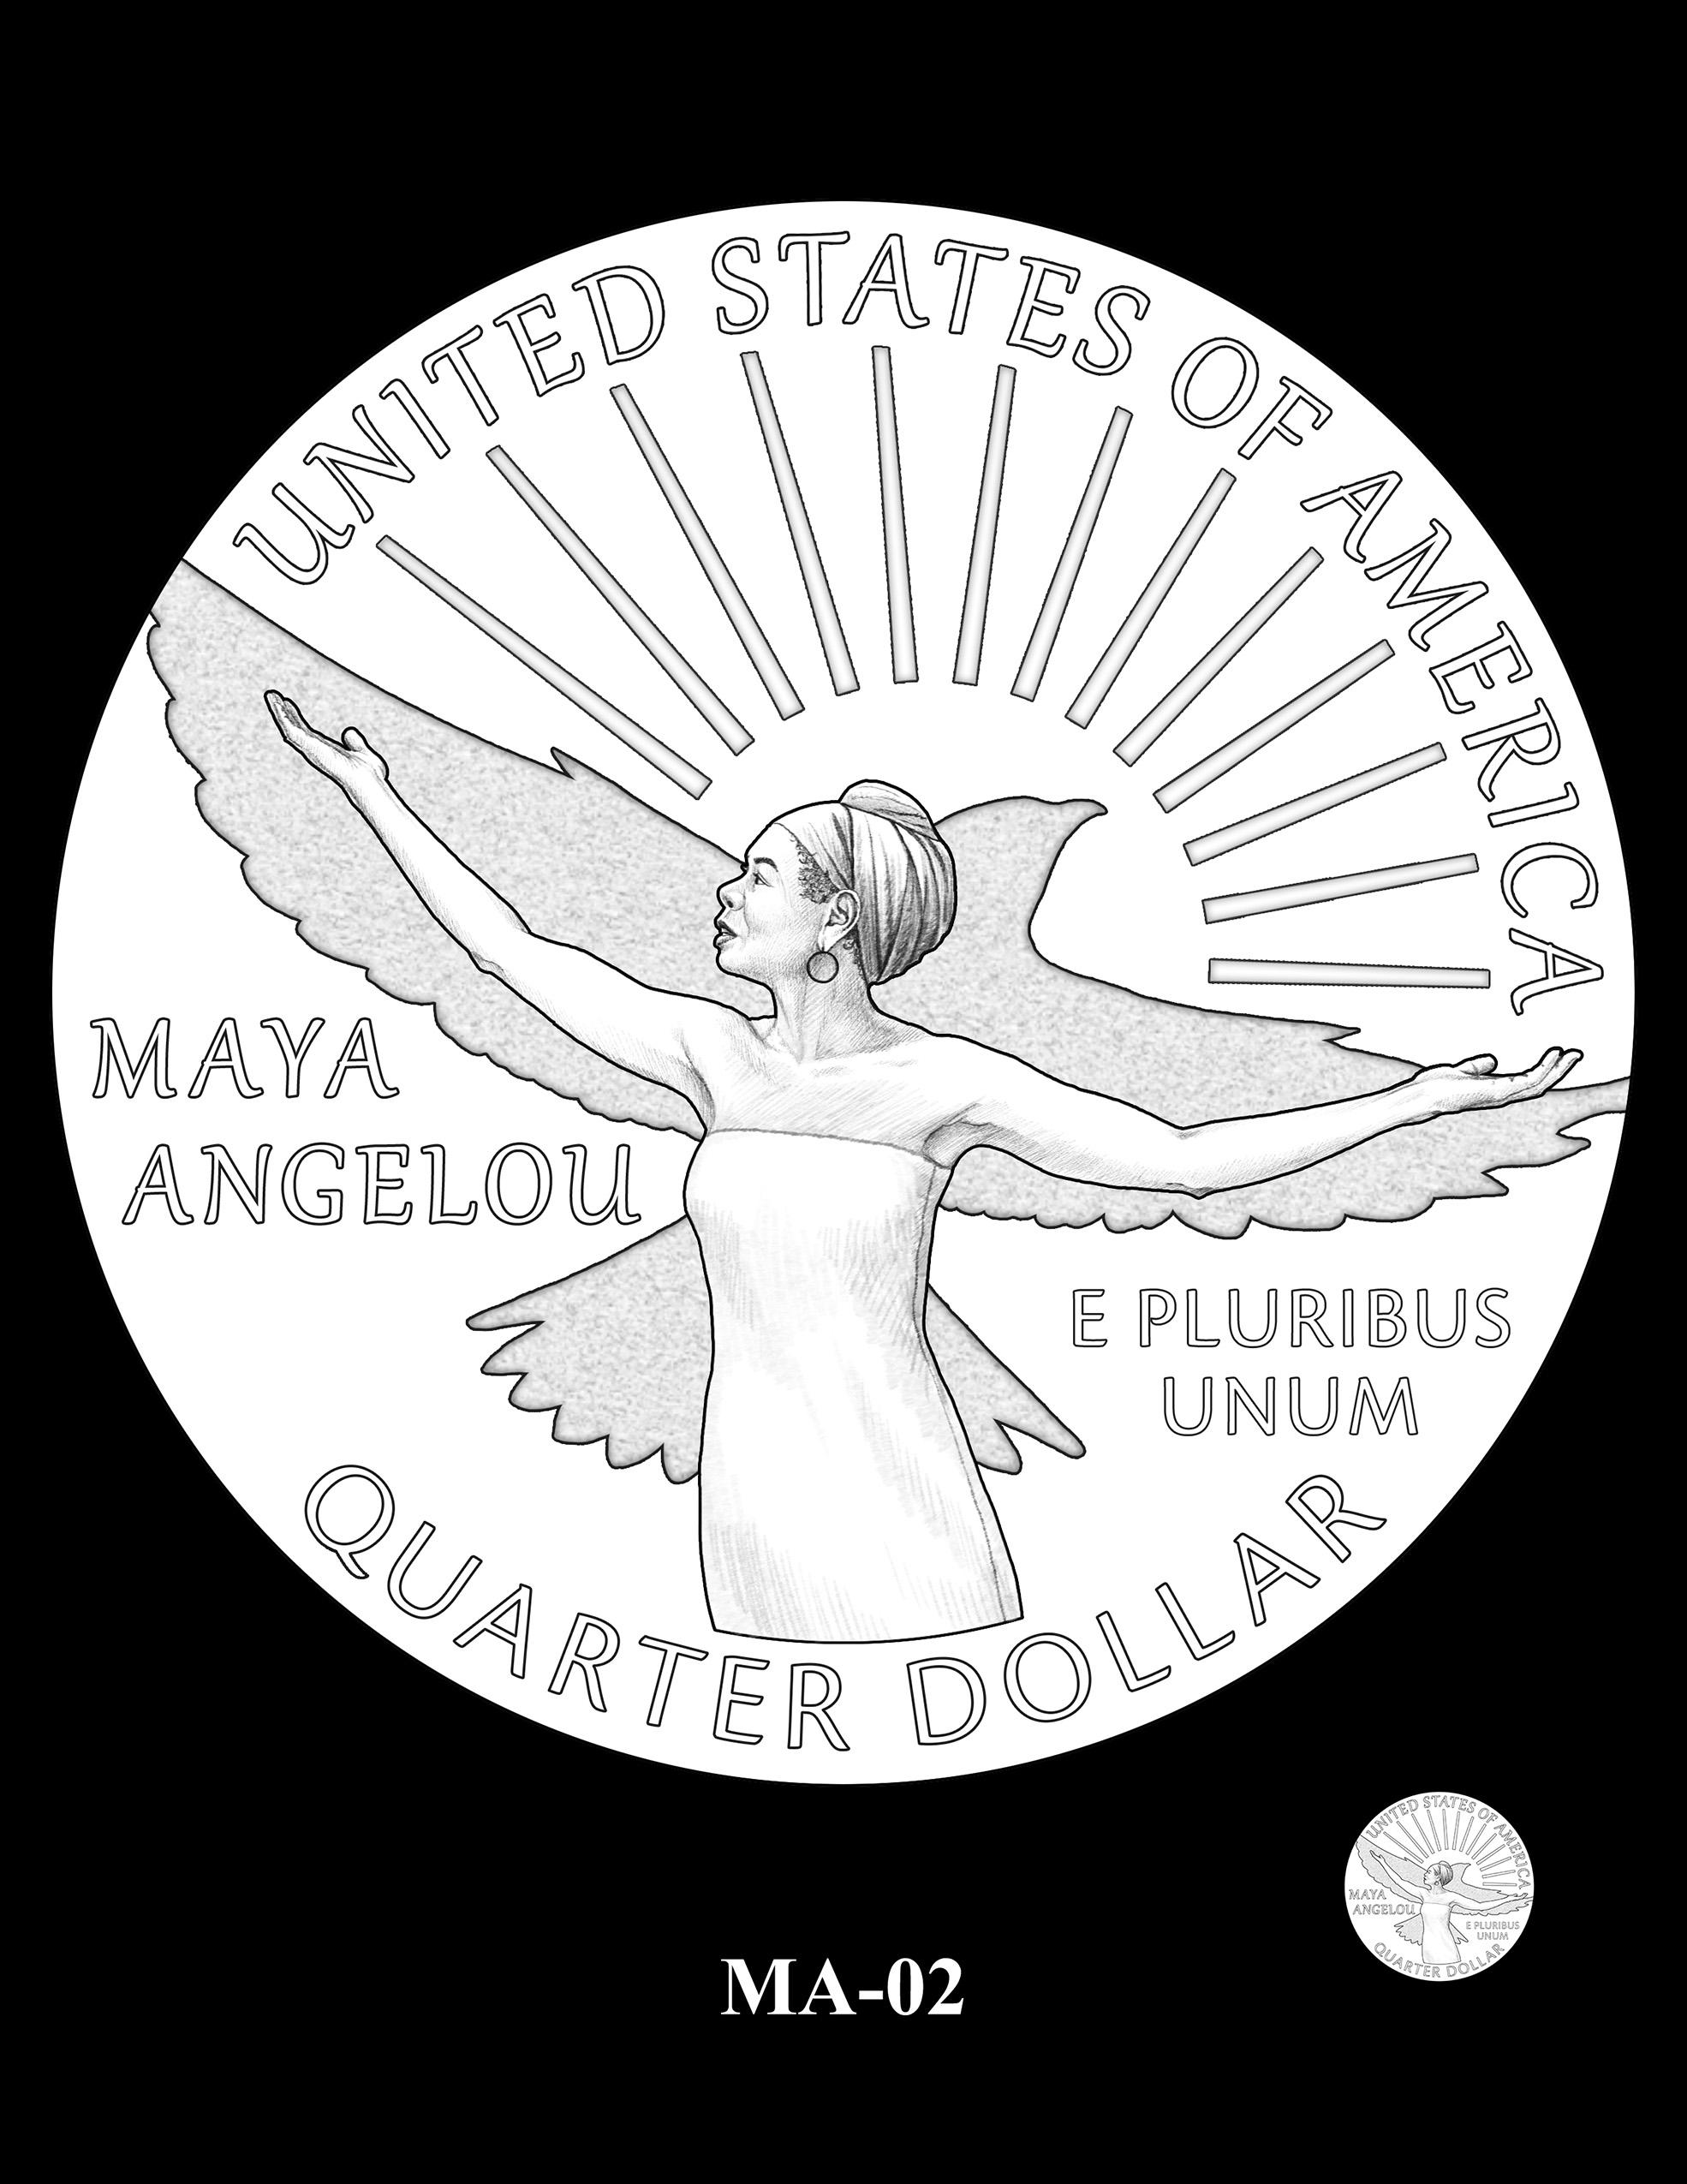 MA-02 -- 2022 American Women Quarters - Maya Angelou Reverse